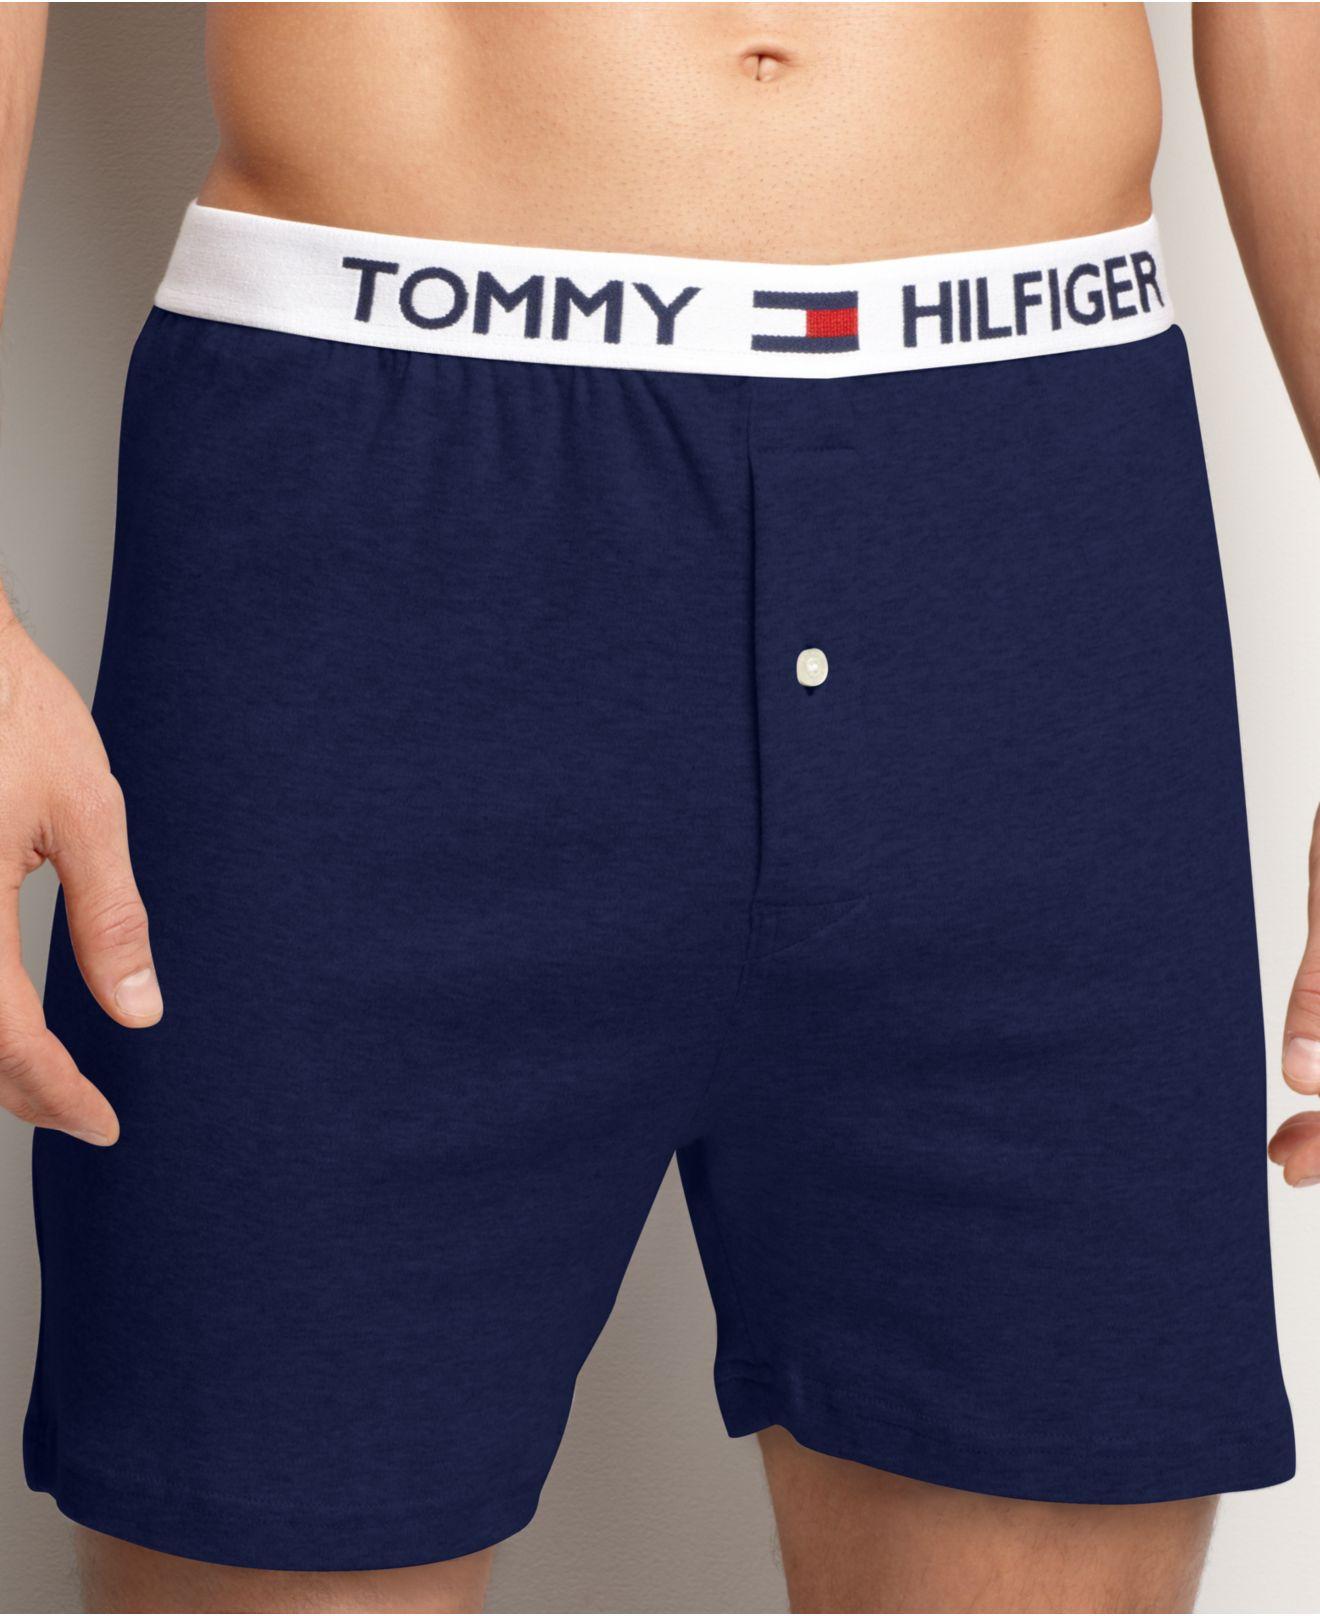 tommy hilfiger athletic knit boxer in blue for men masters navy save 40 lyst. Black Bedroom Furniture Sets. Home Design Ideas